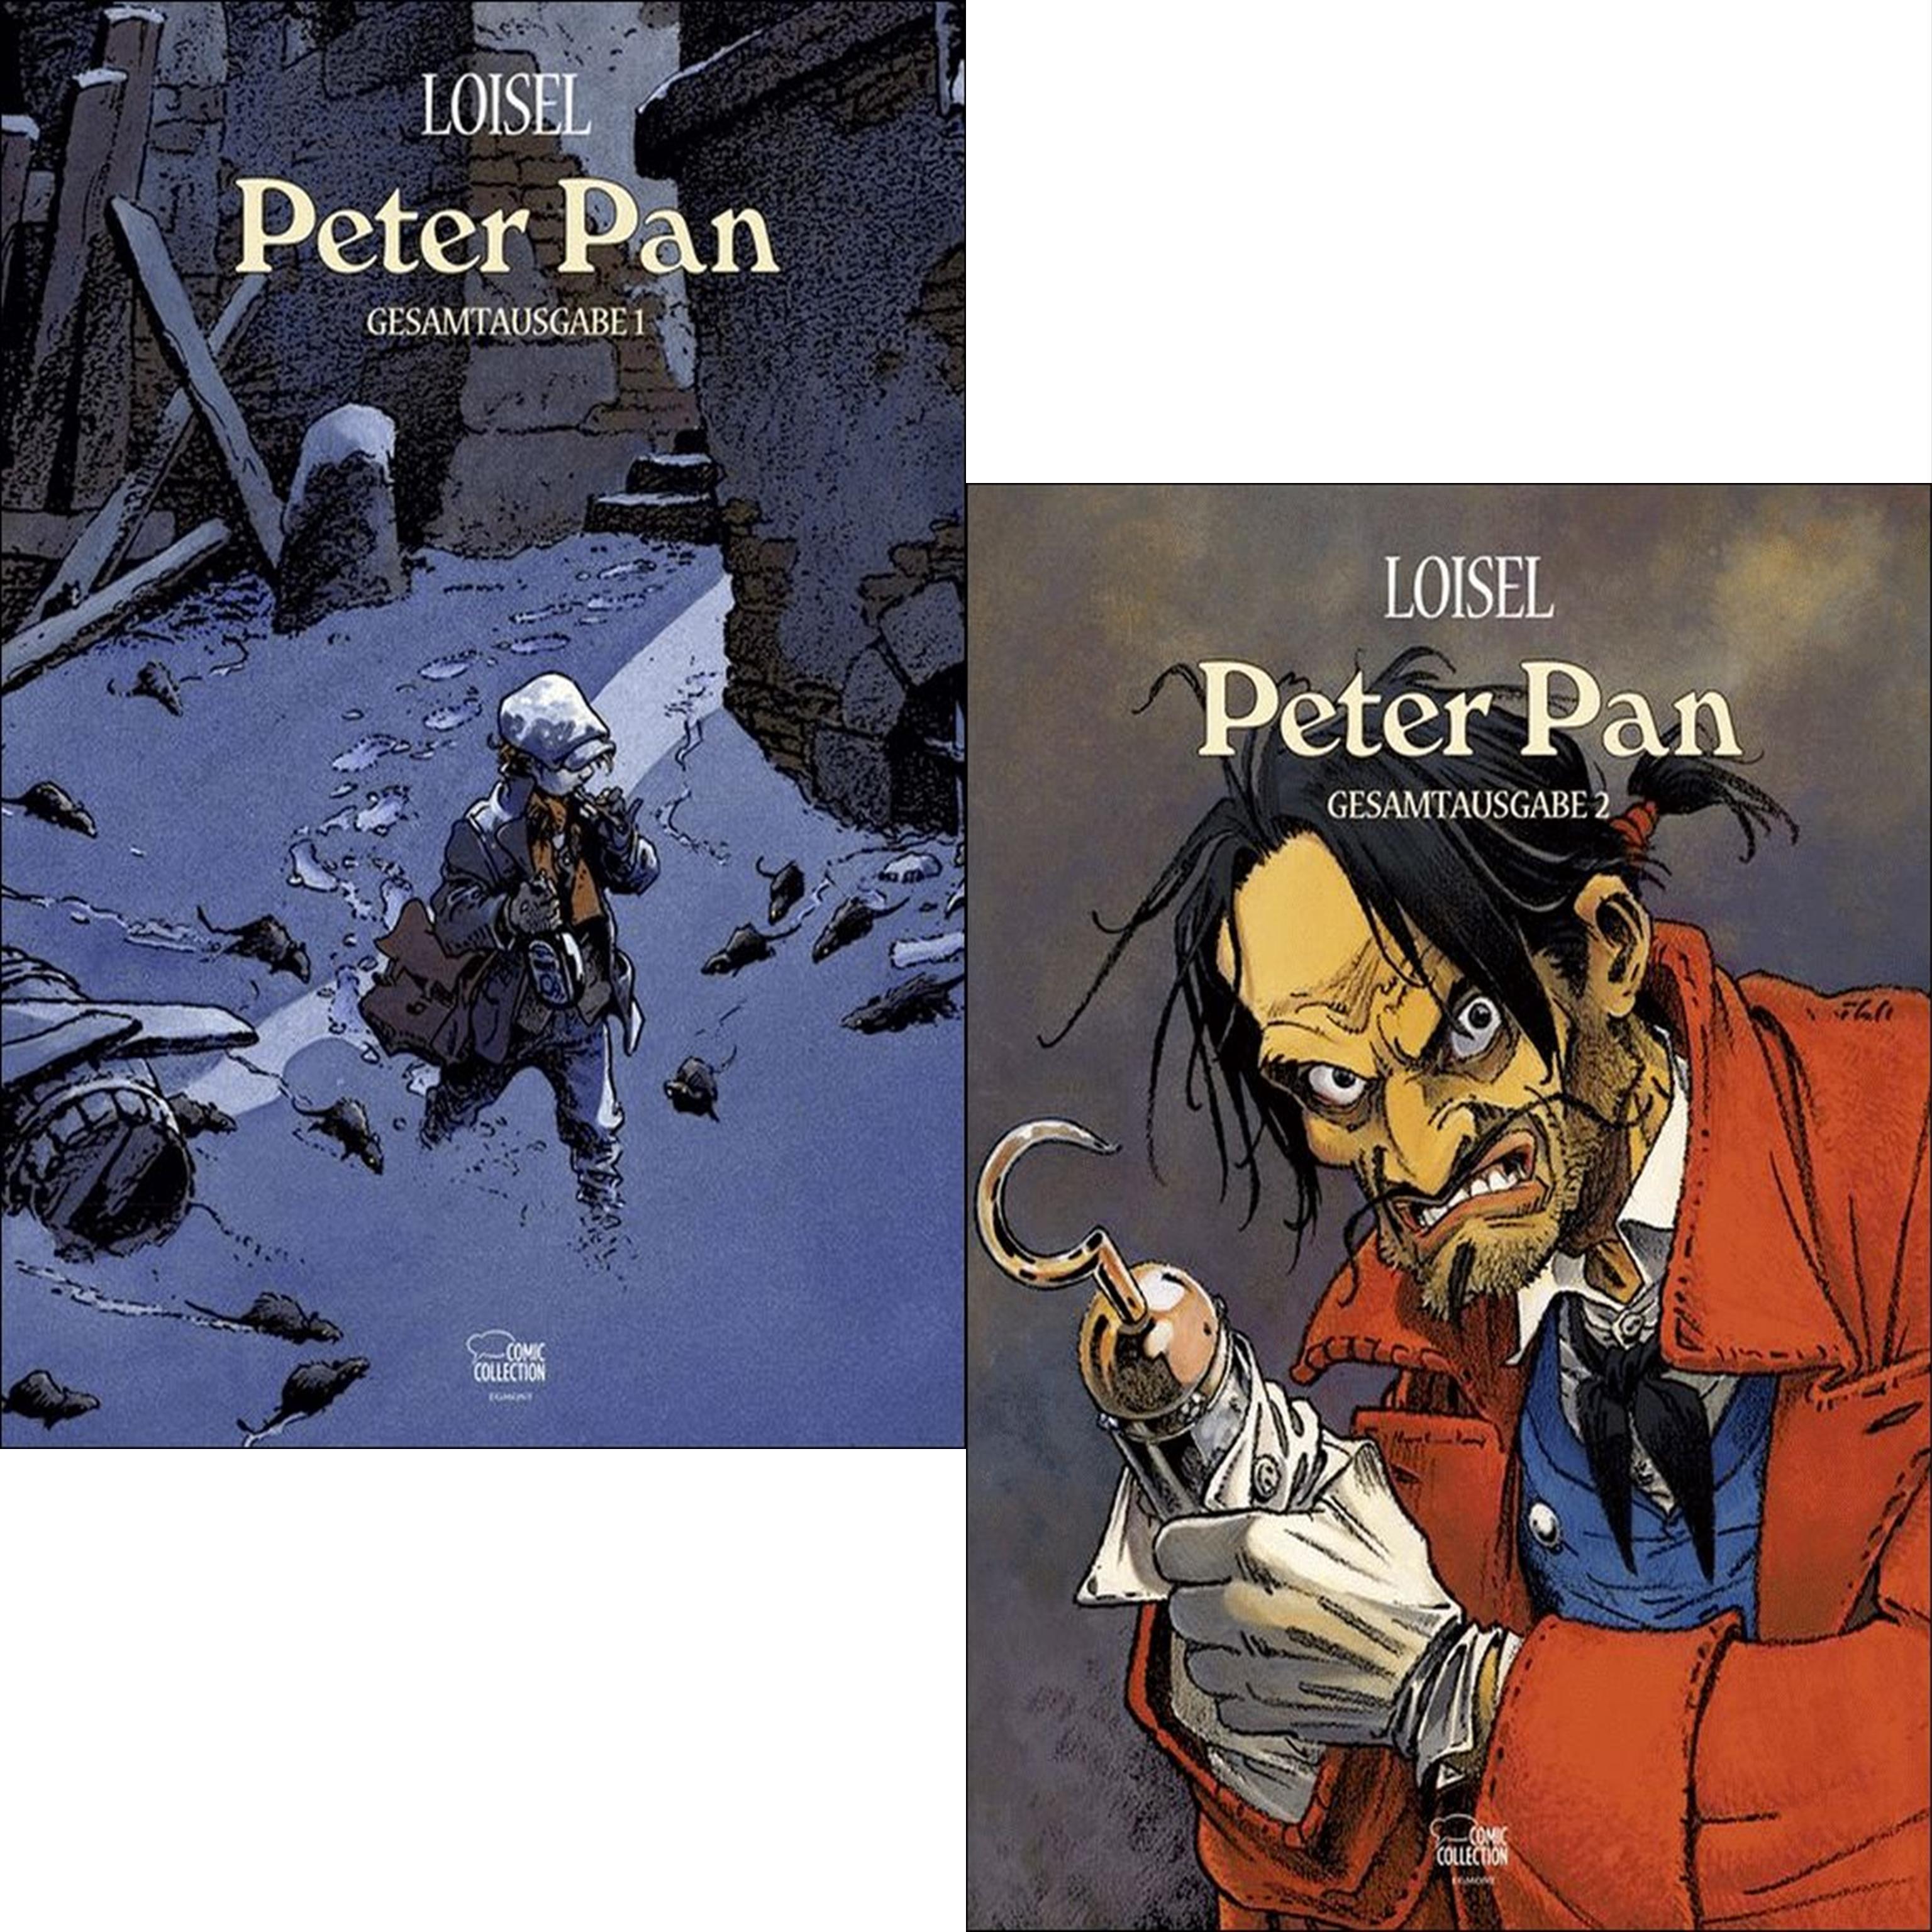 PETER PAN Gesamtausgabe 1 + 2 IM SET